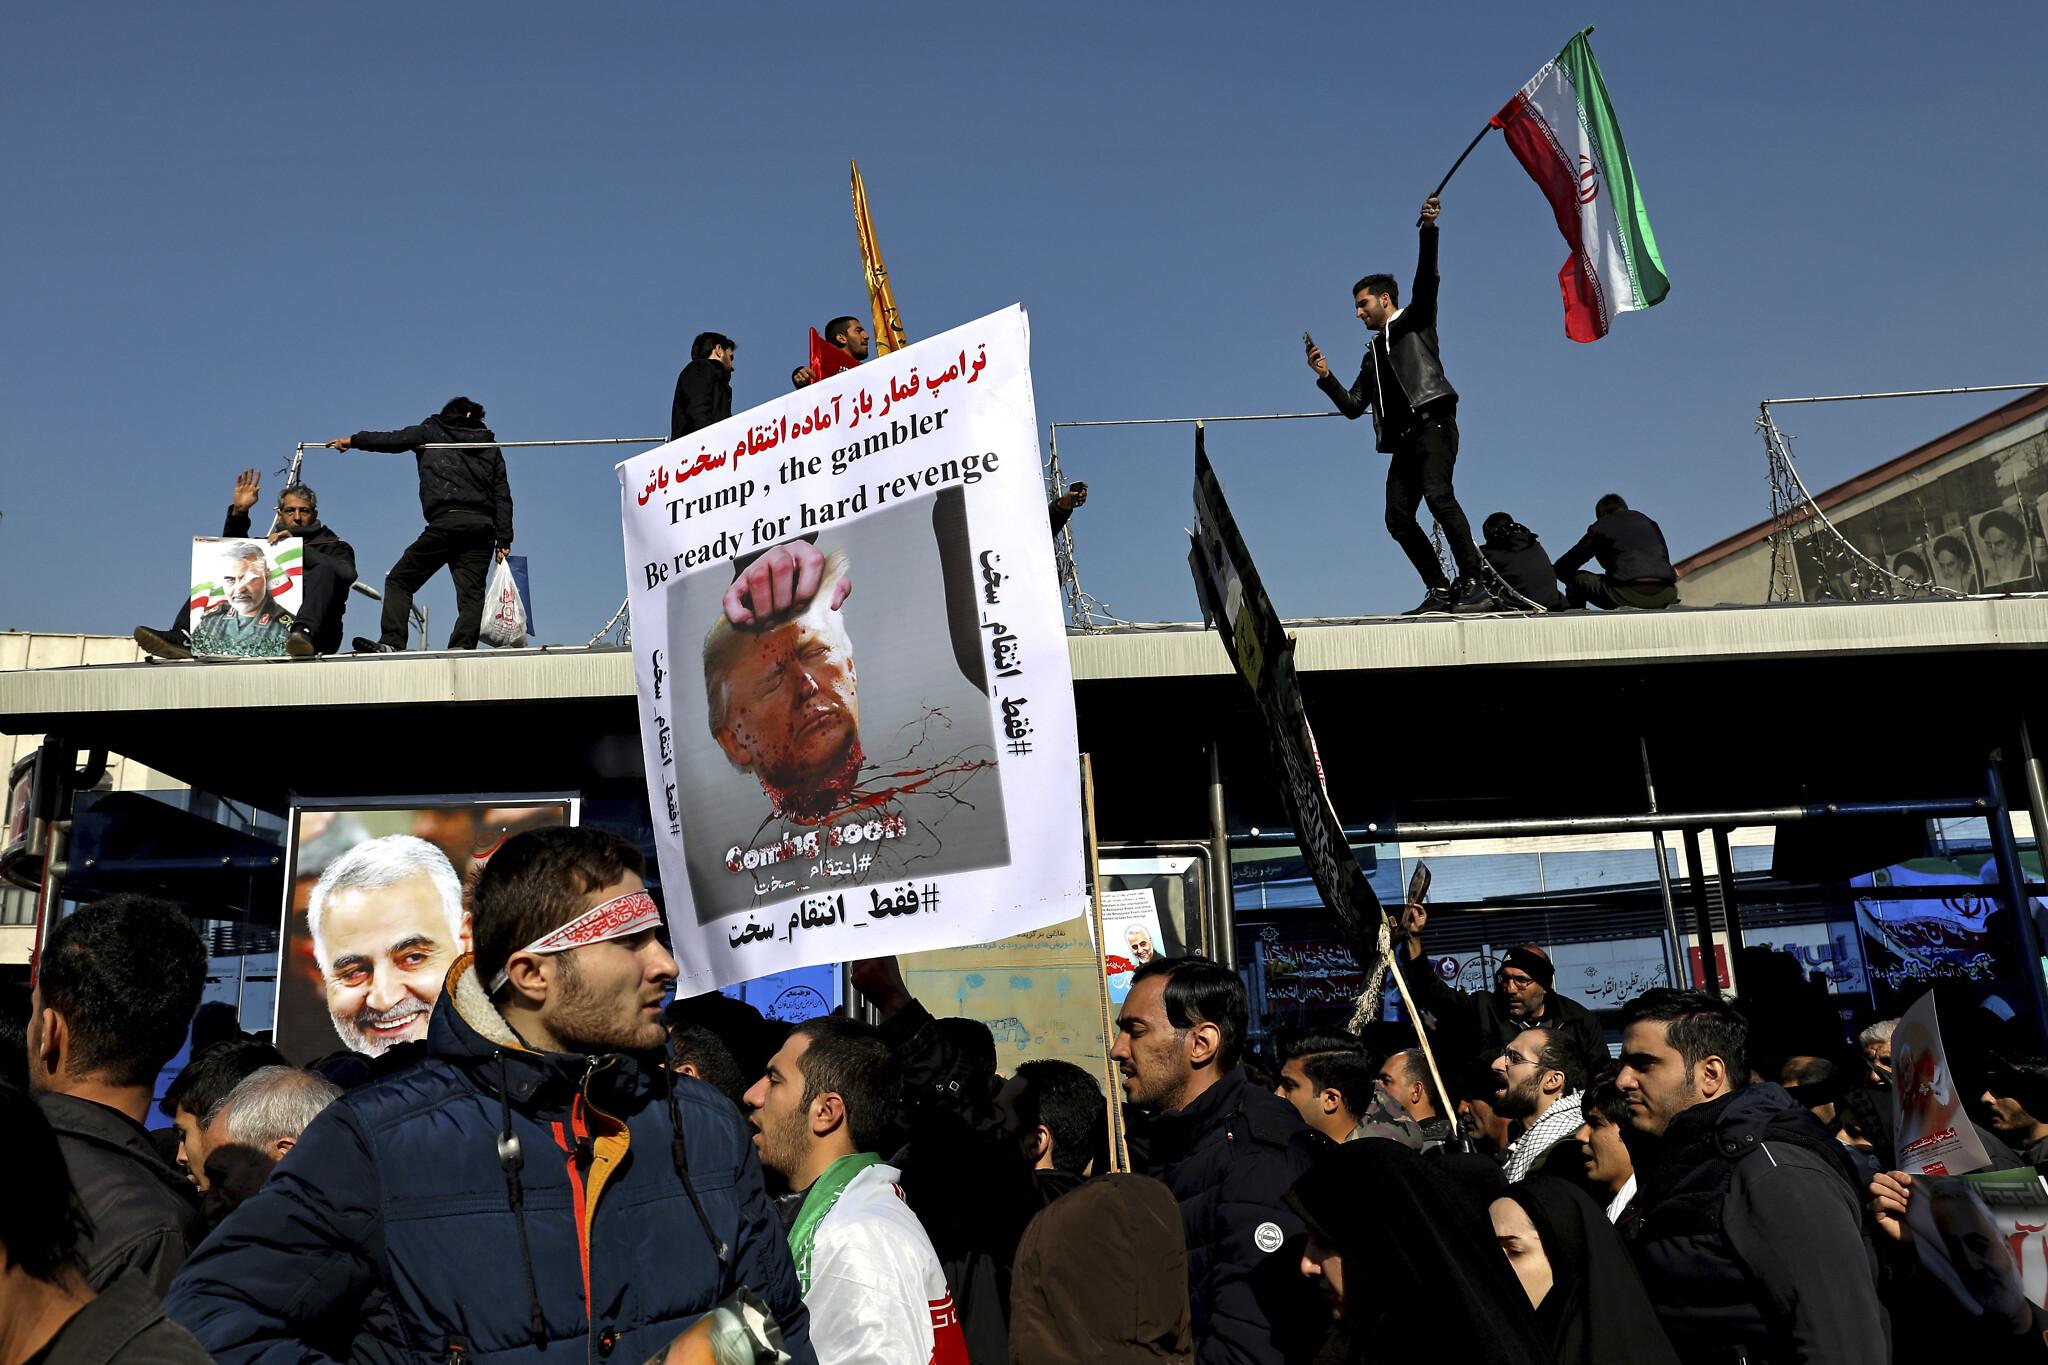 Iranci mašu zastavama i drže sliku obezglavljenog Donalda Trampa, Teheran, 06. januar 2020. (Foto: Ebrahim Noroozi/AP)